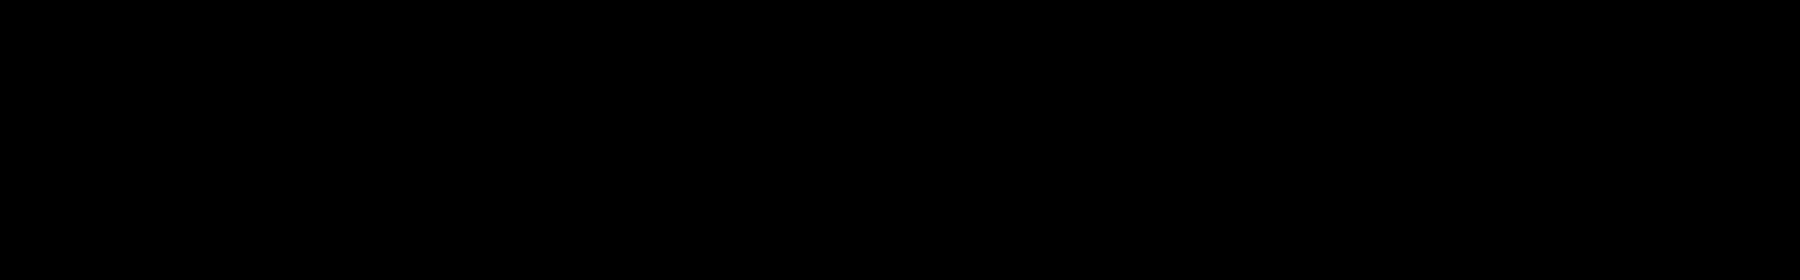 Razor Dubstep audio waveform